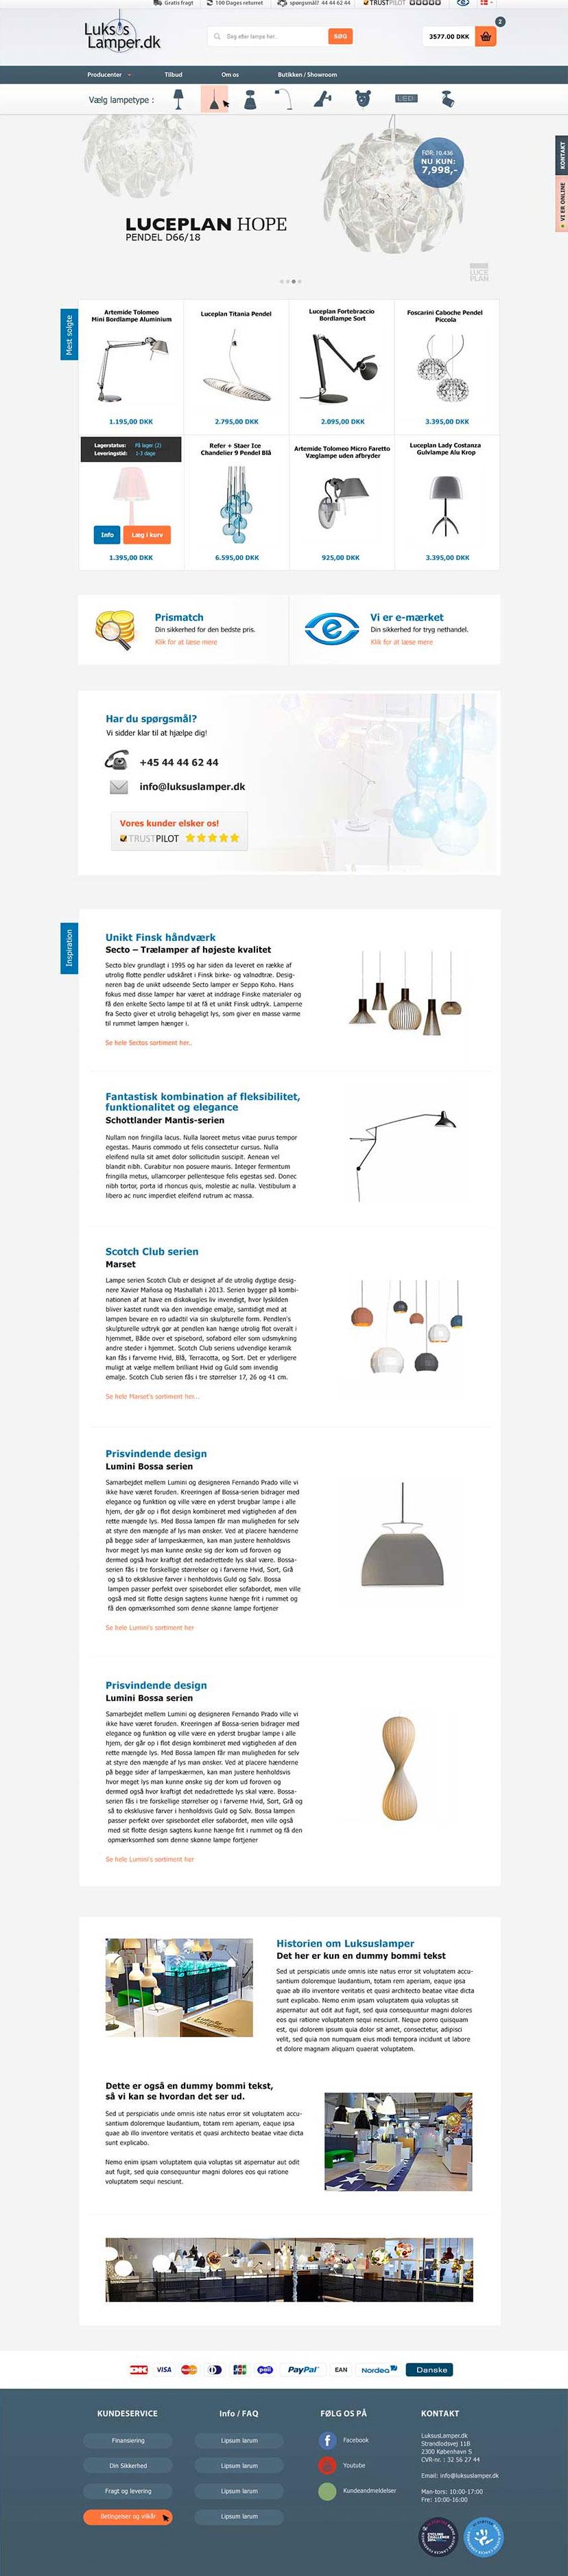 luksuslamper_designudkast